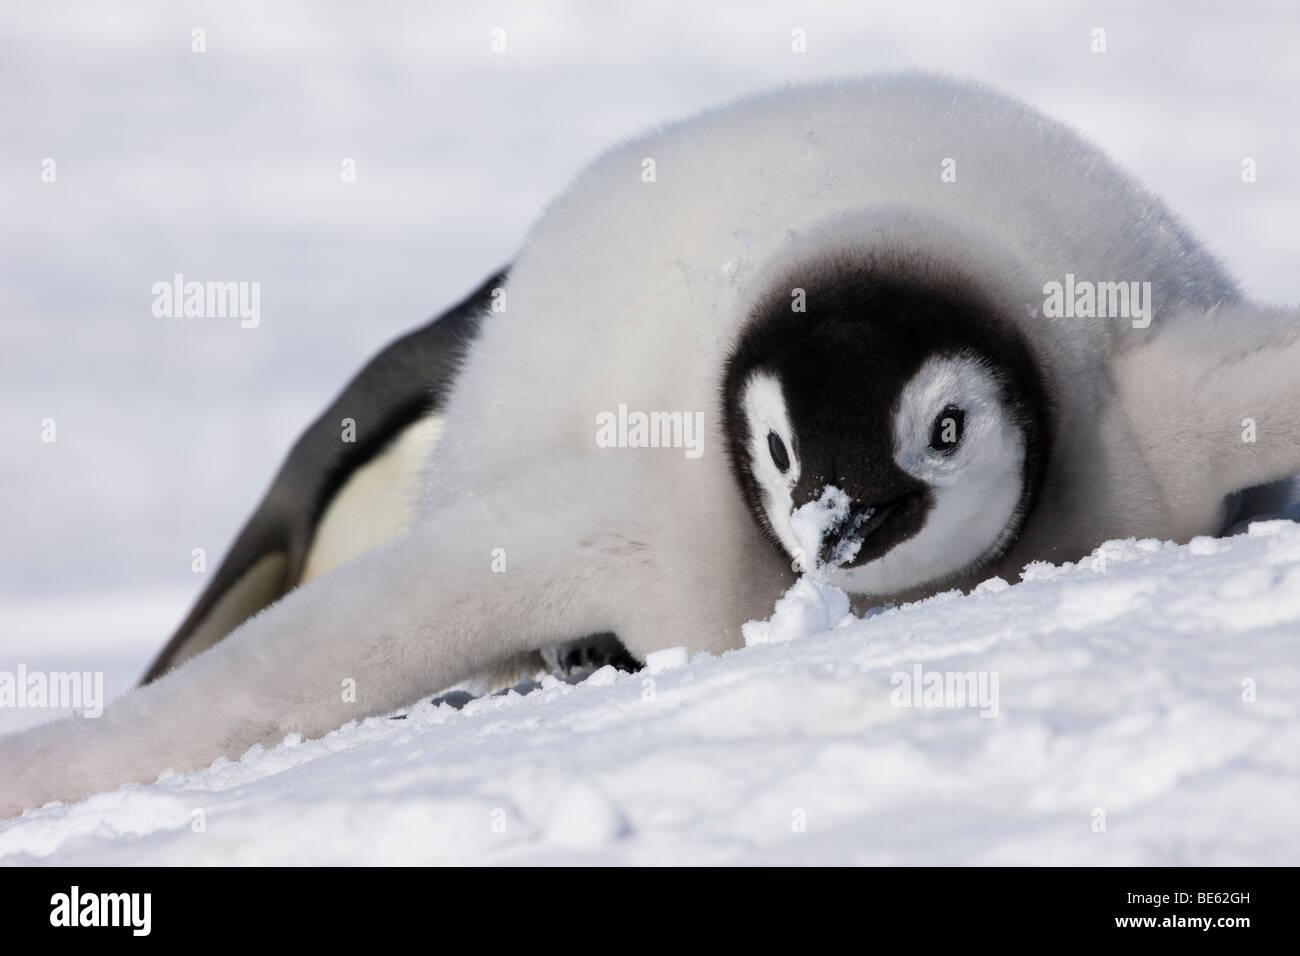 baby penguin in snow